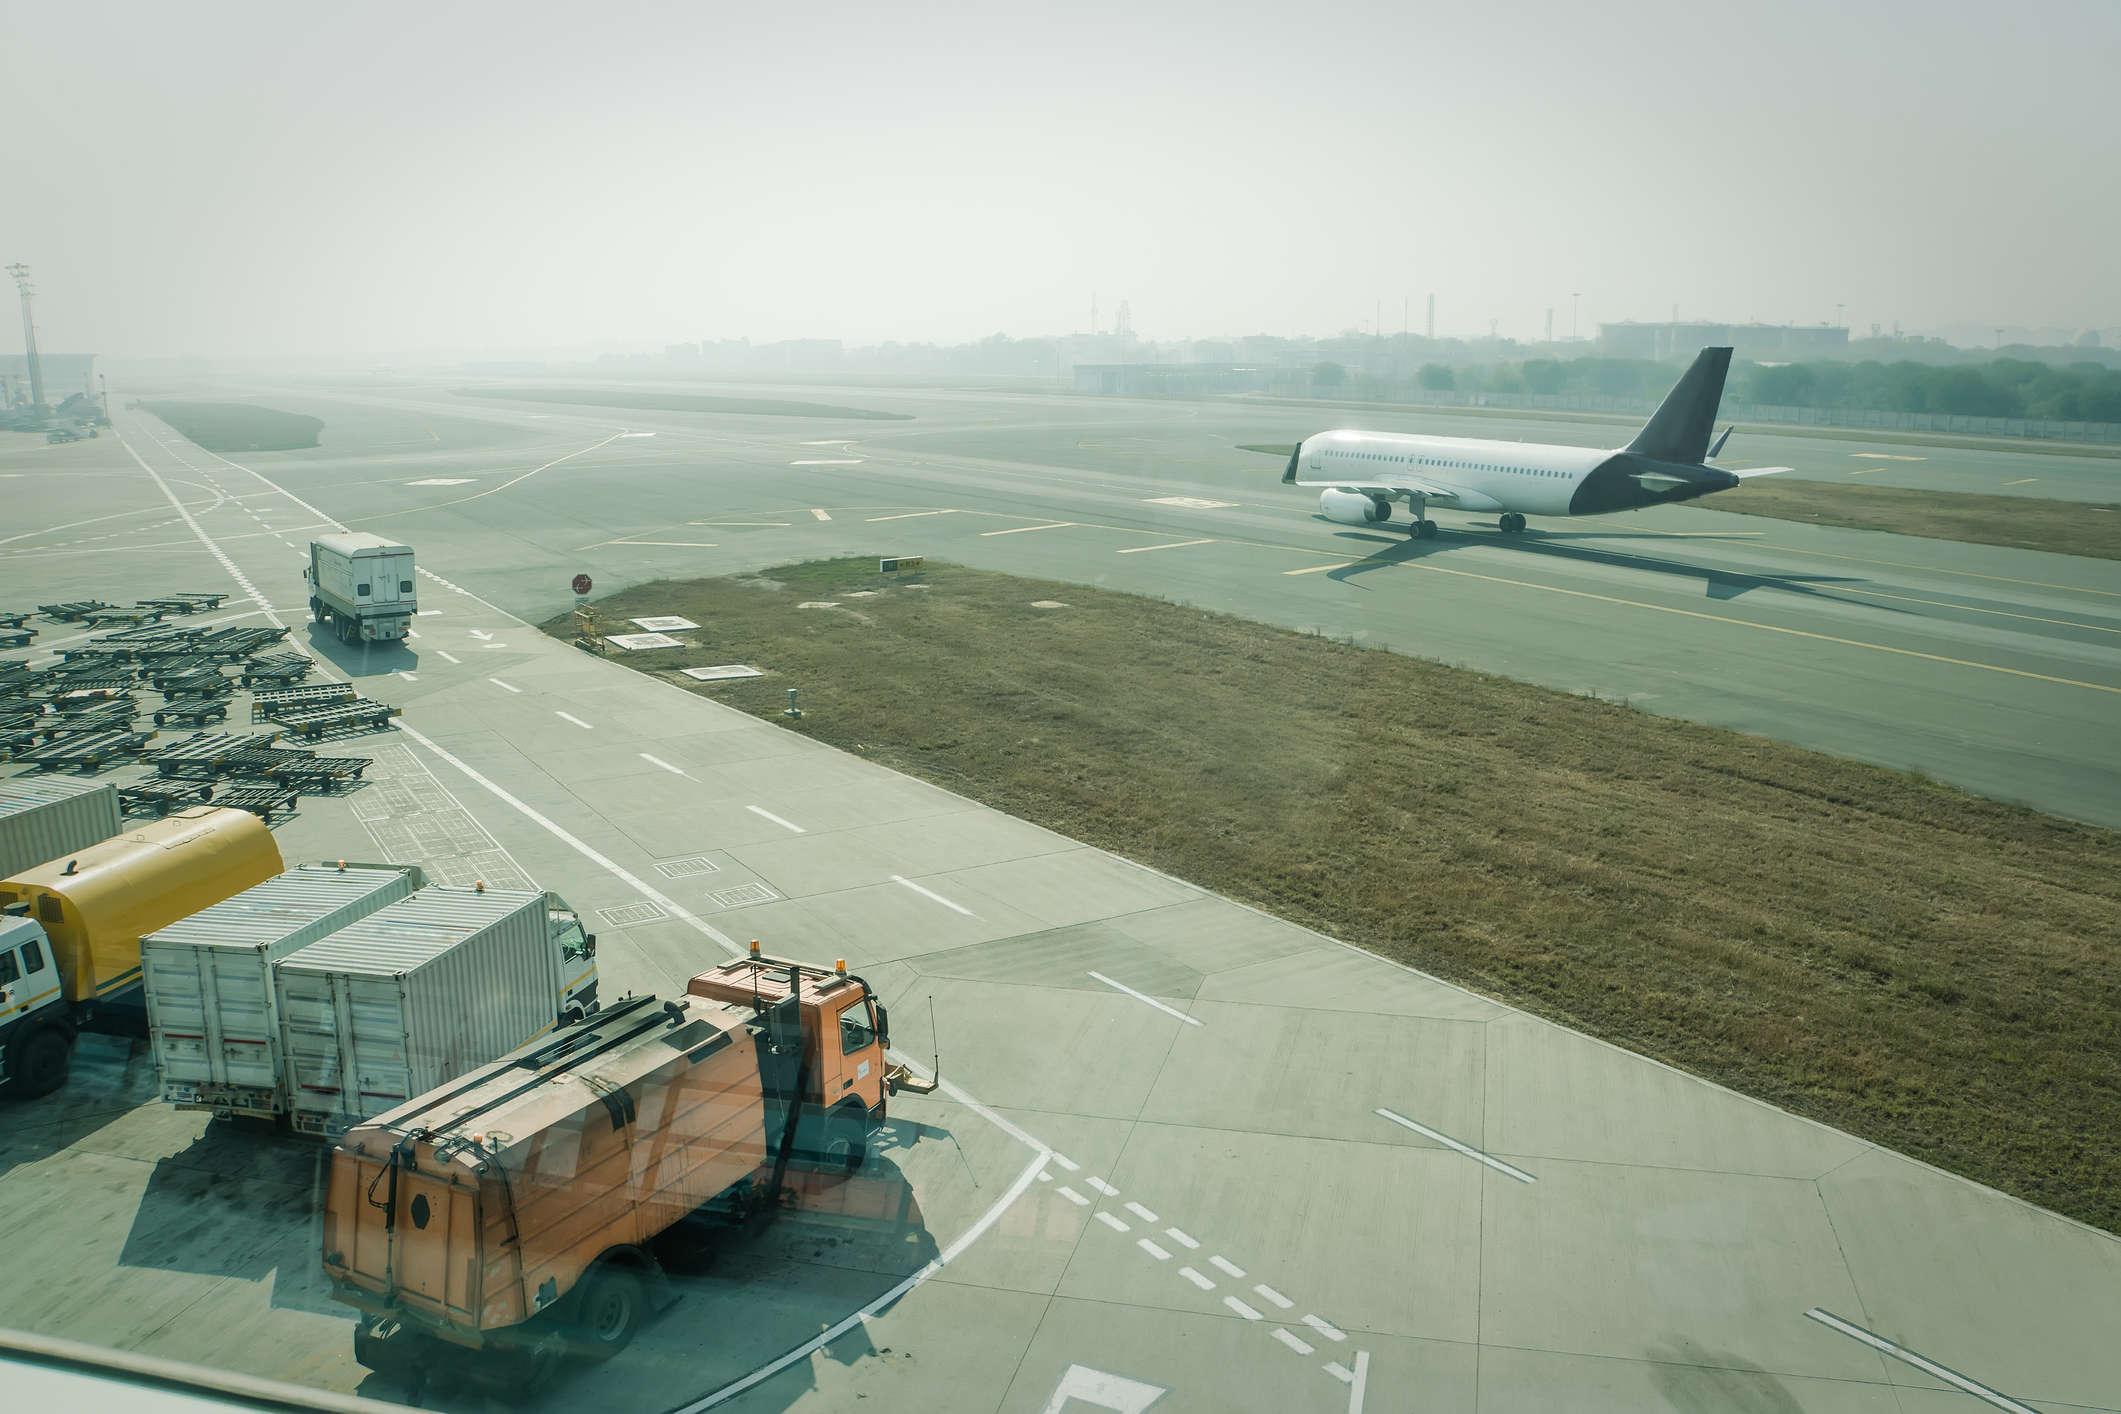 Jewar Airport officially named as Noida International Airport